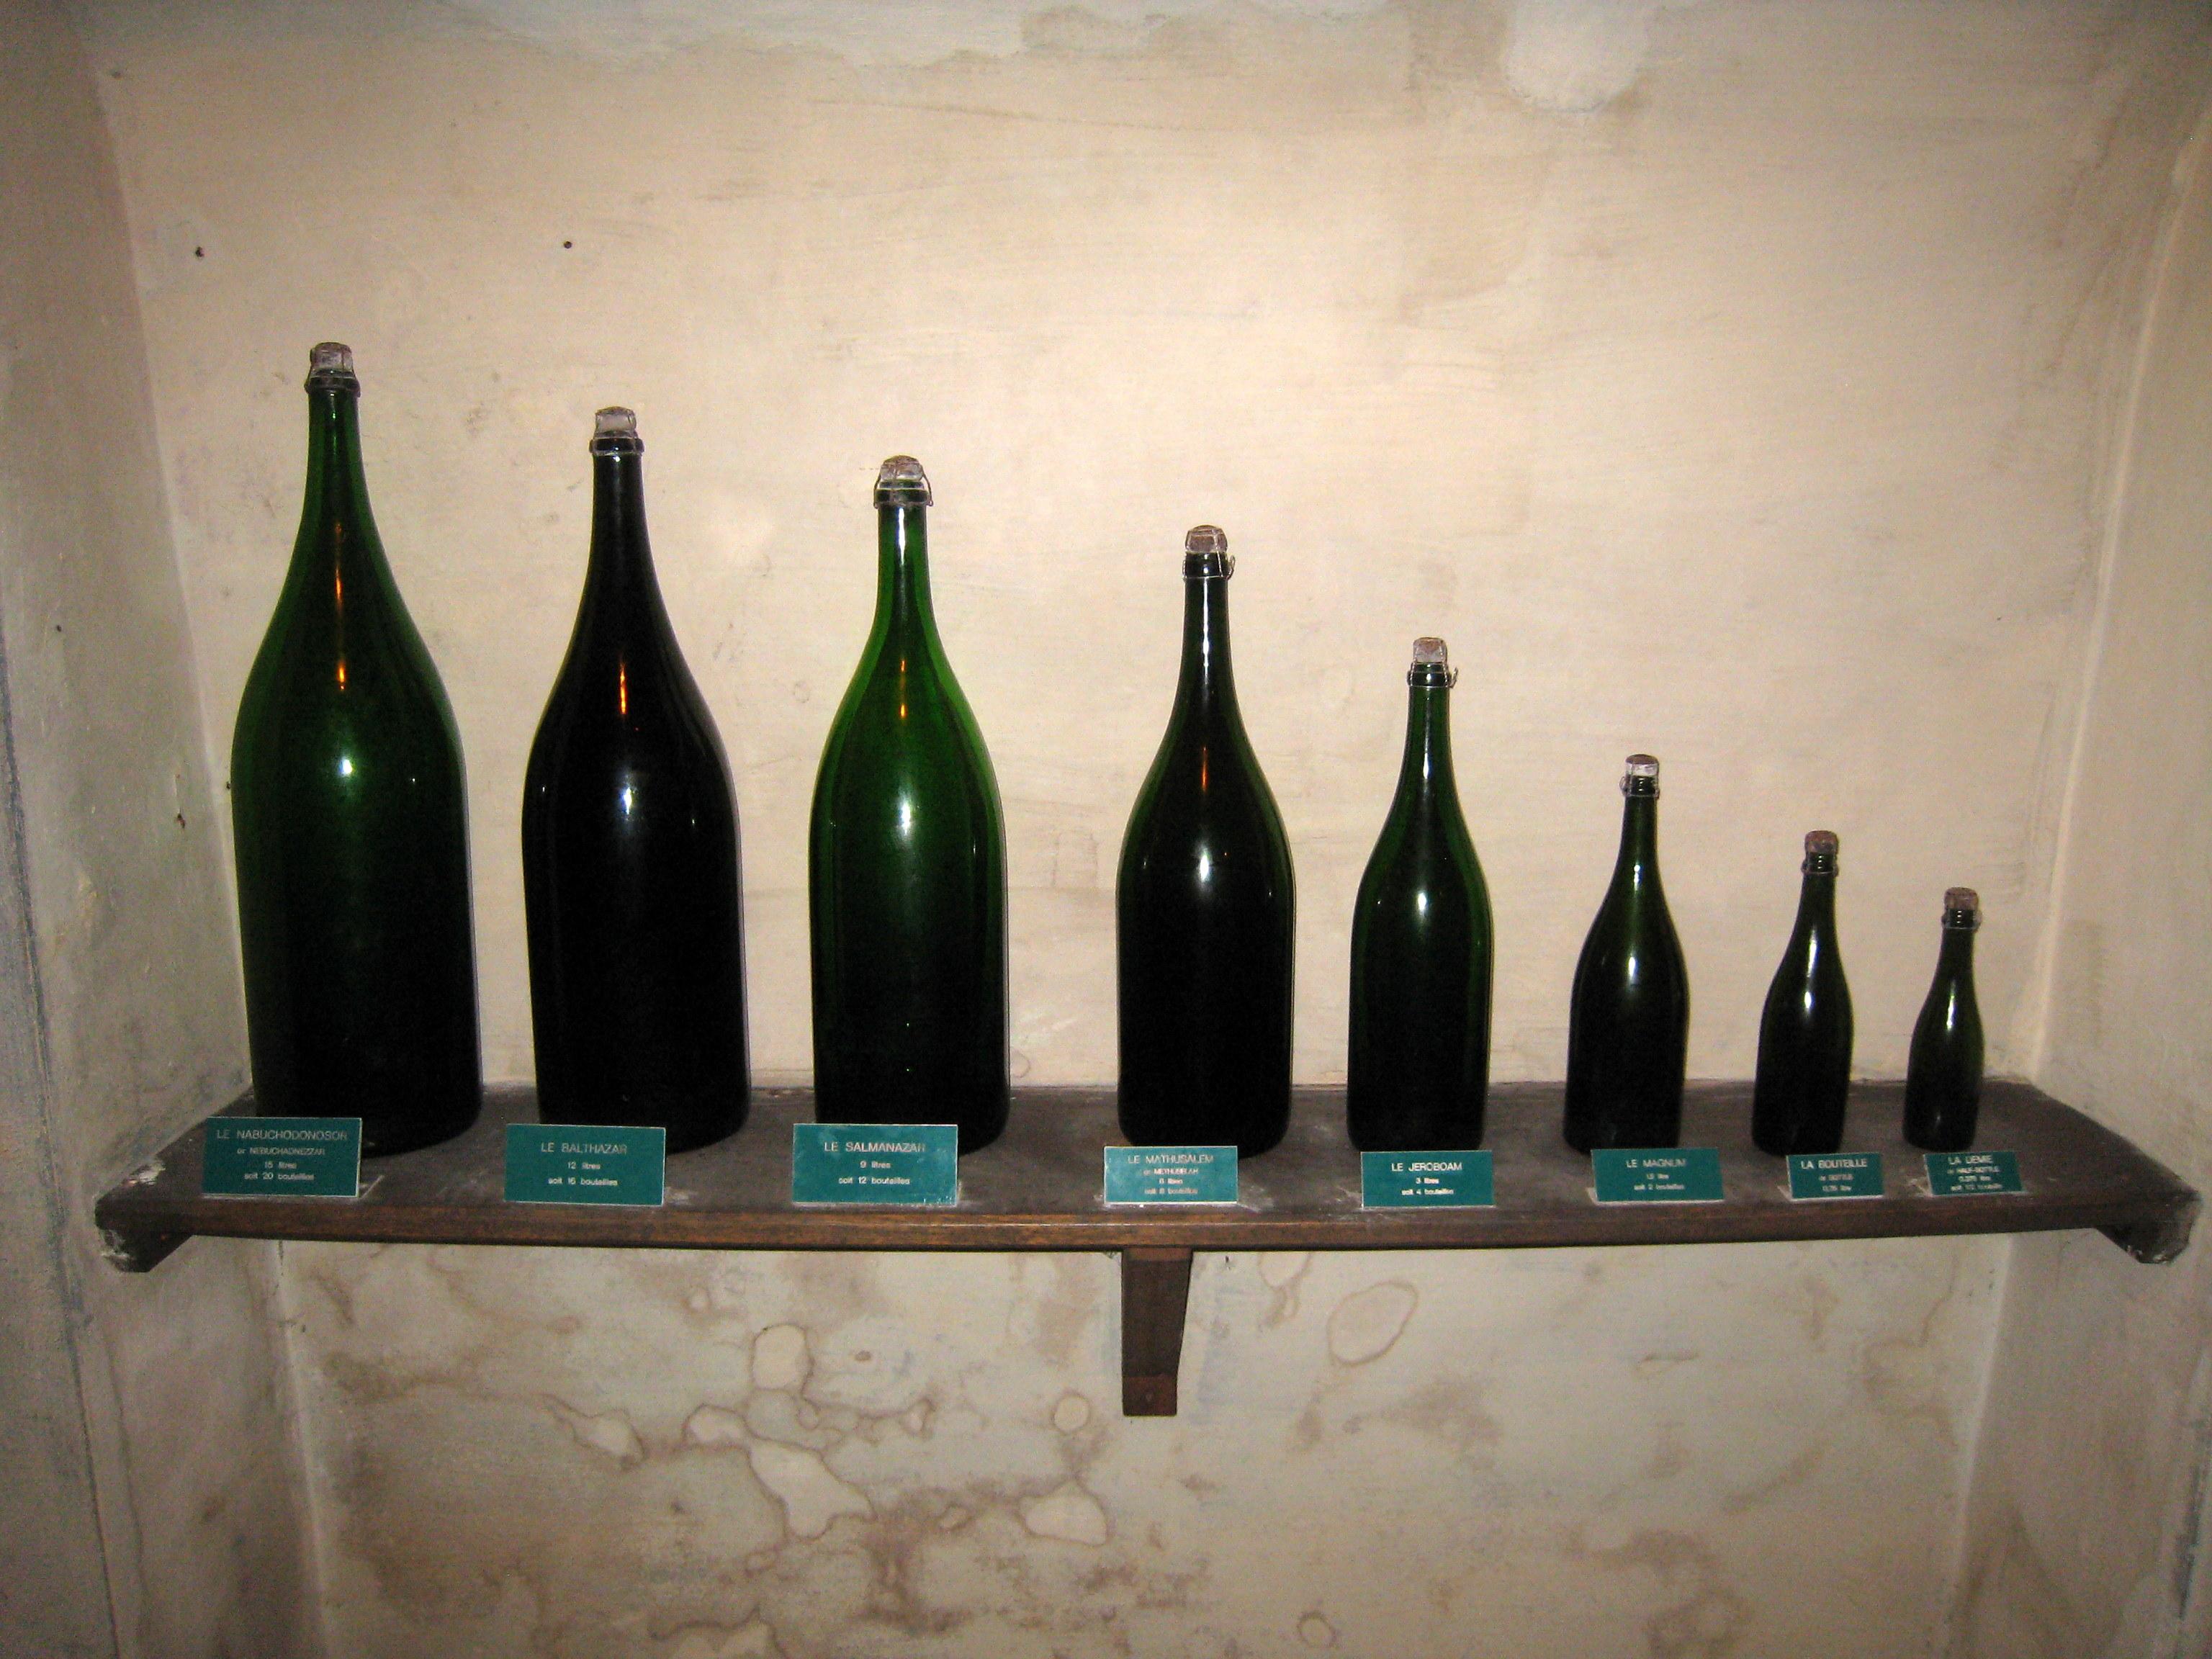 champage bottle sizes